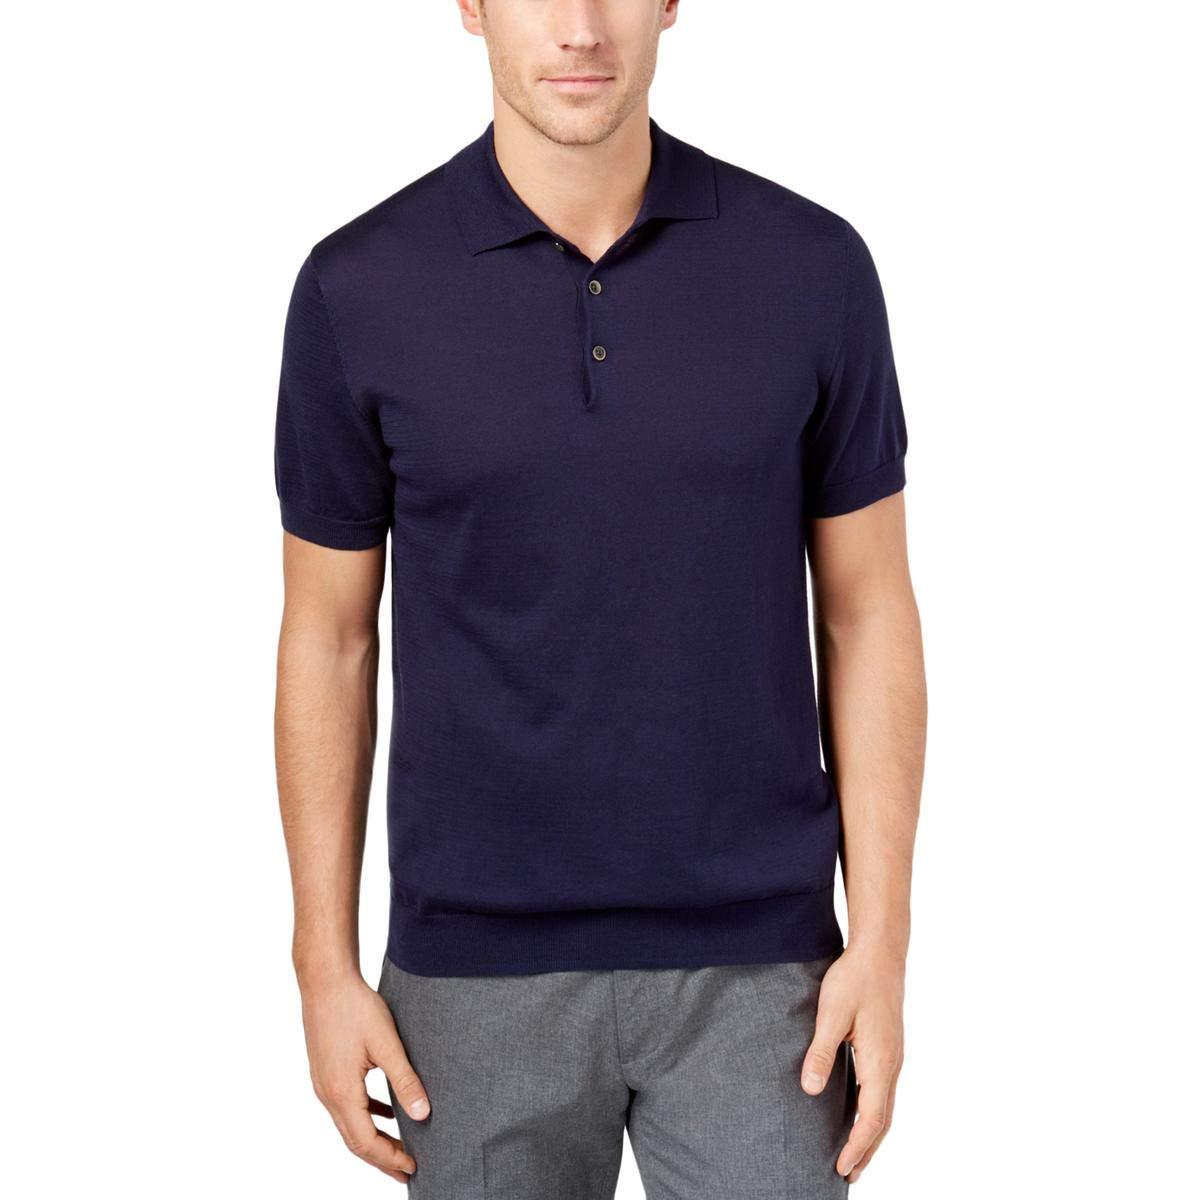 0158aa2d Tasso Elba Mens SS Rugby Polo Shirt navyblue L